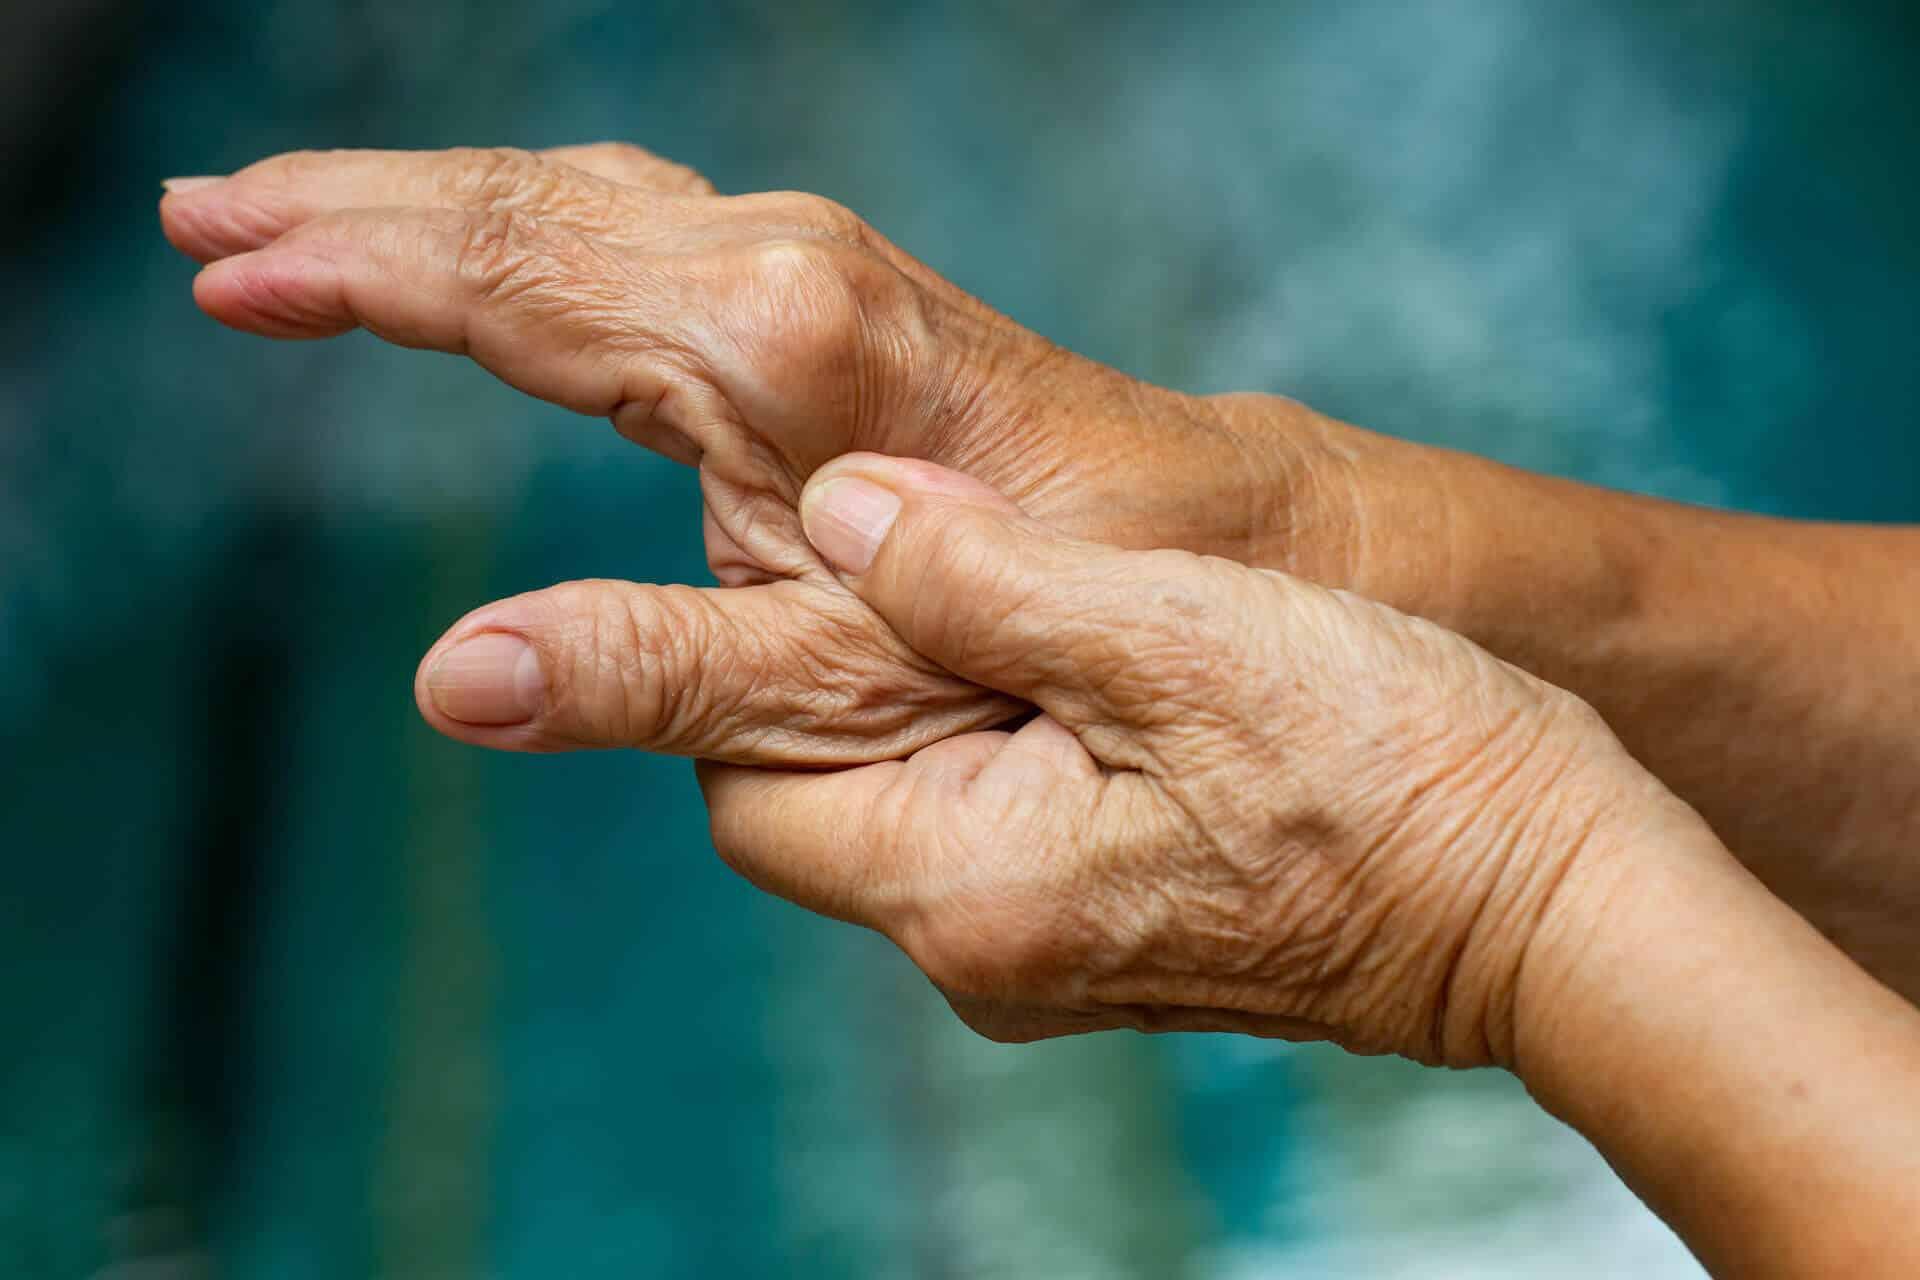 pr-eric-roulot-chirurgie-main-paris-chirurgie-doigt